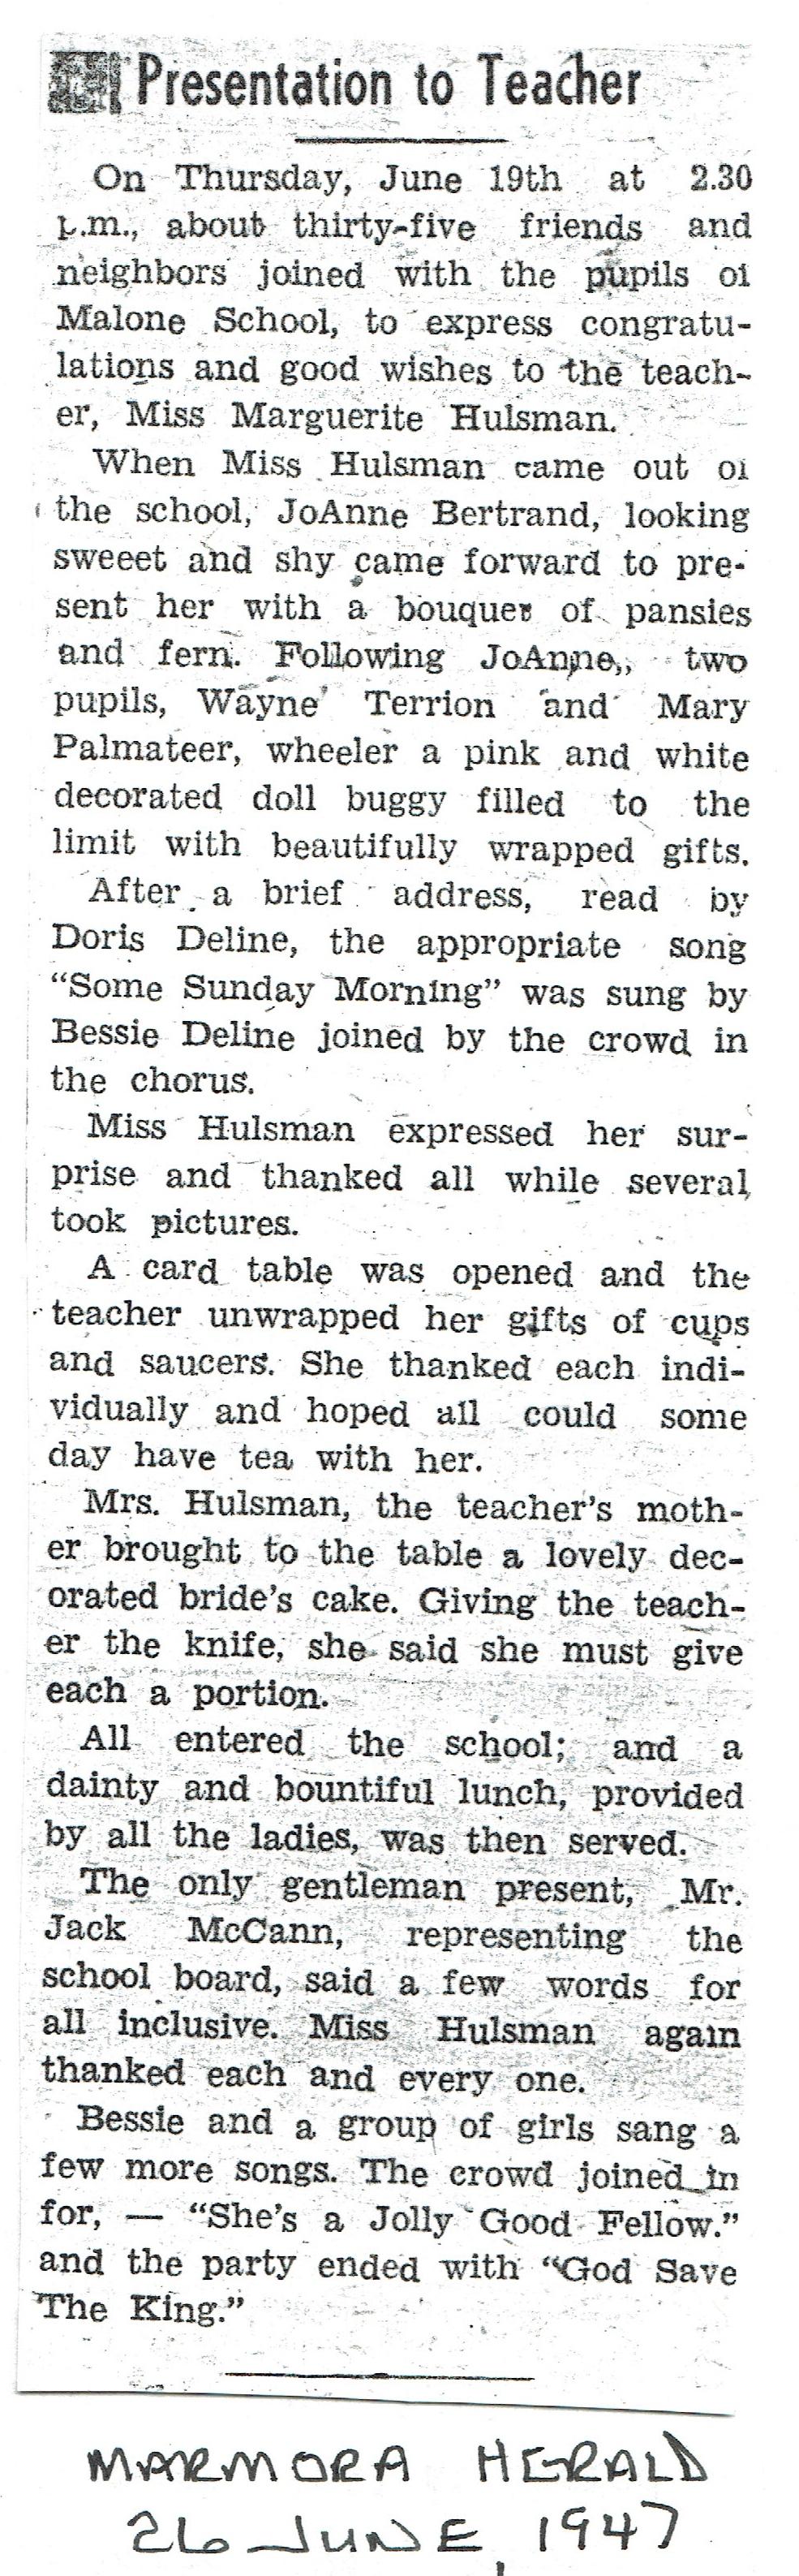 Malone school 1947.jpg